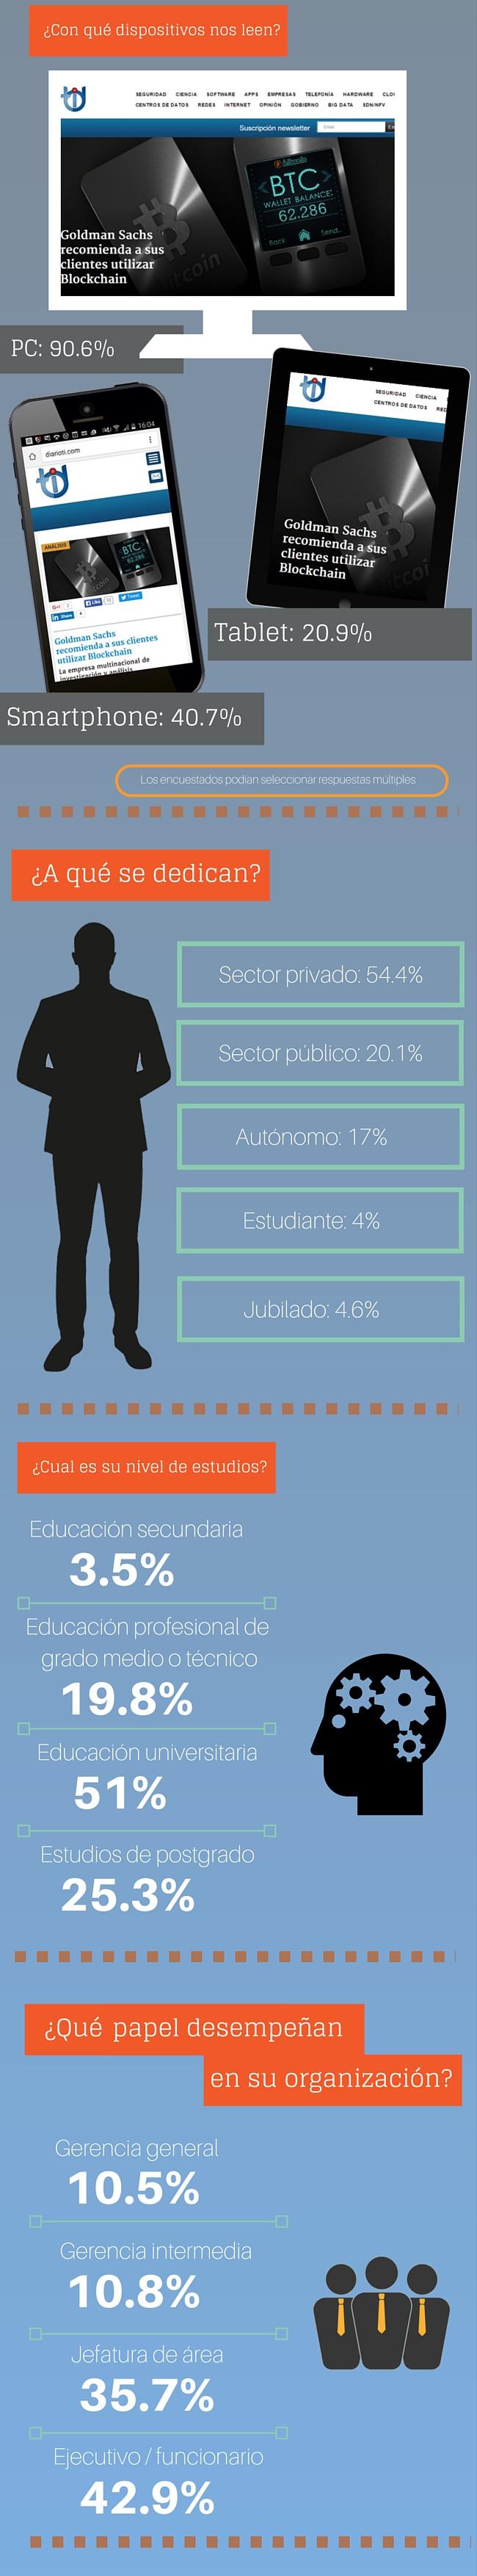 Infografía encuesta lectores Diario TI - 2